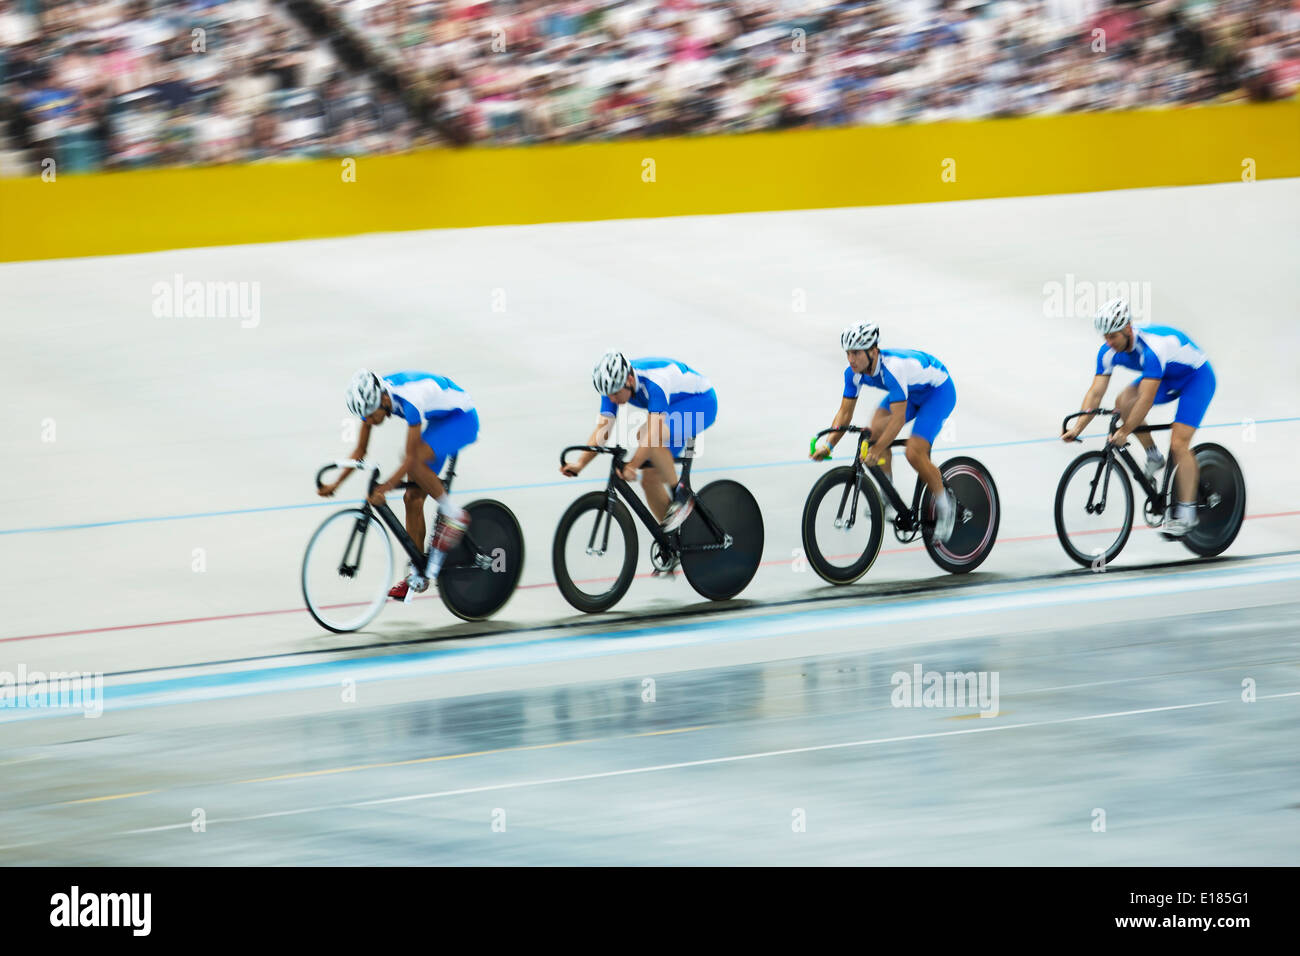 Track cycling team riding around velodrome - Stock Image